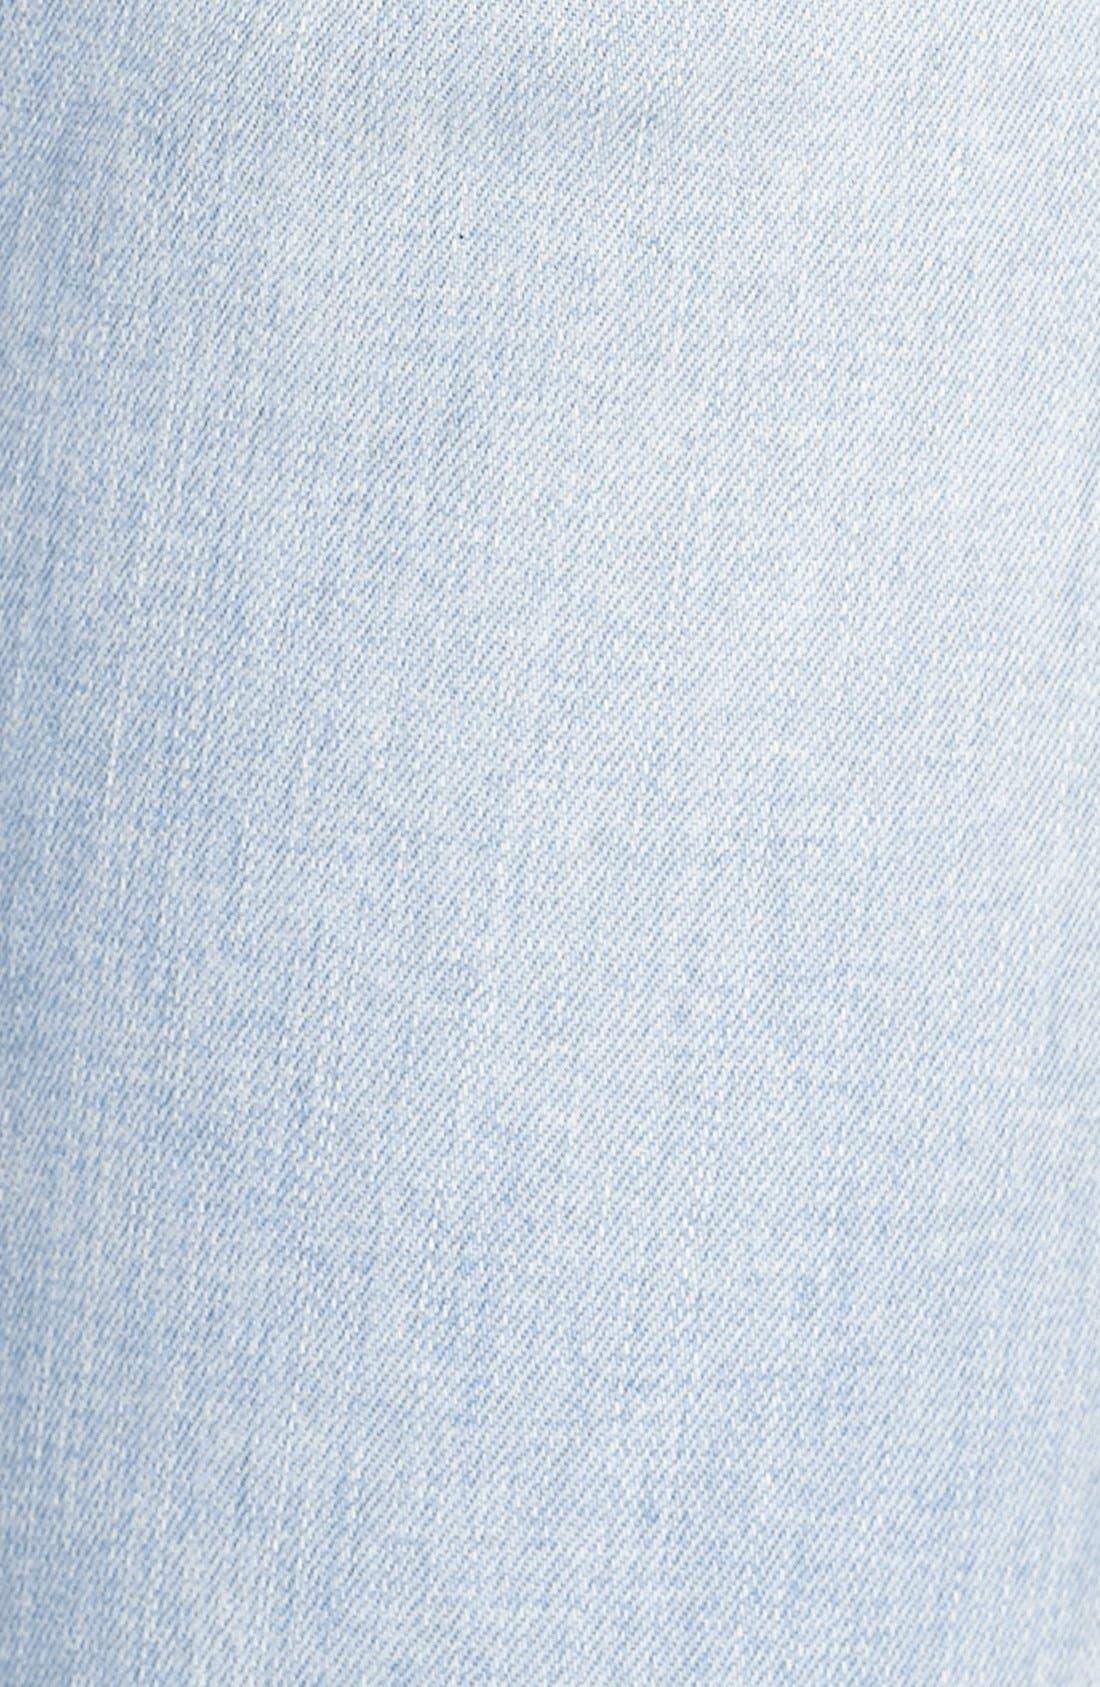 Alternate Image 5  - RES Denim 'Kitty' Skinny Jeans (Love Moves Destroyer)